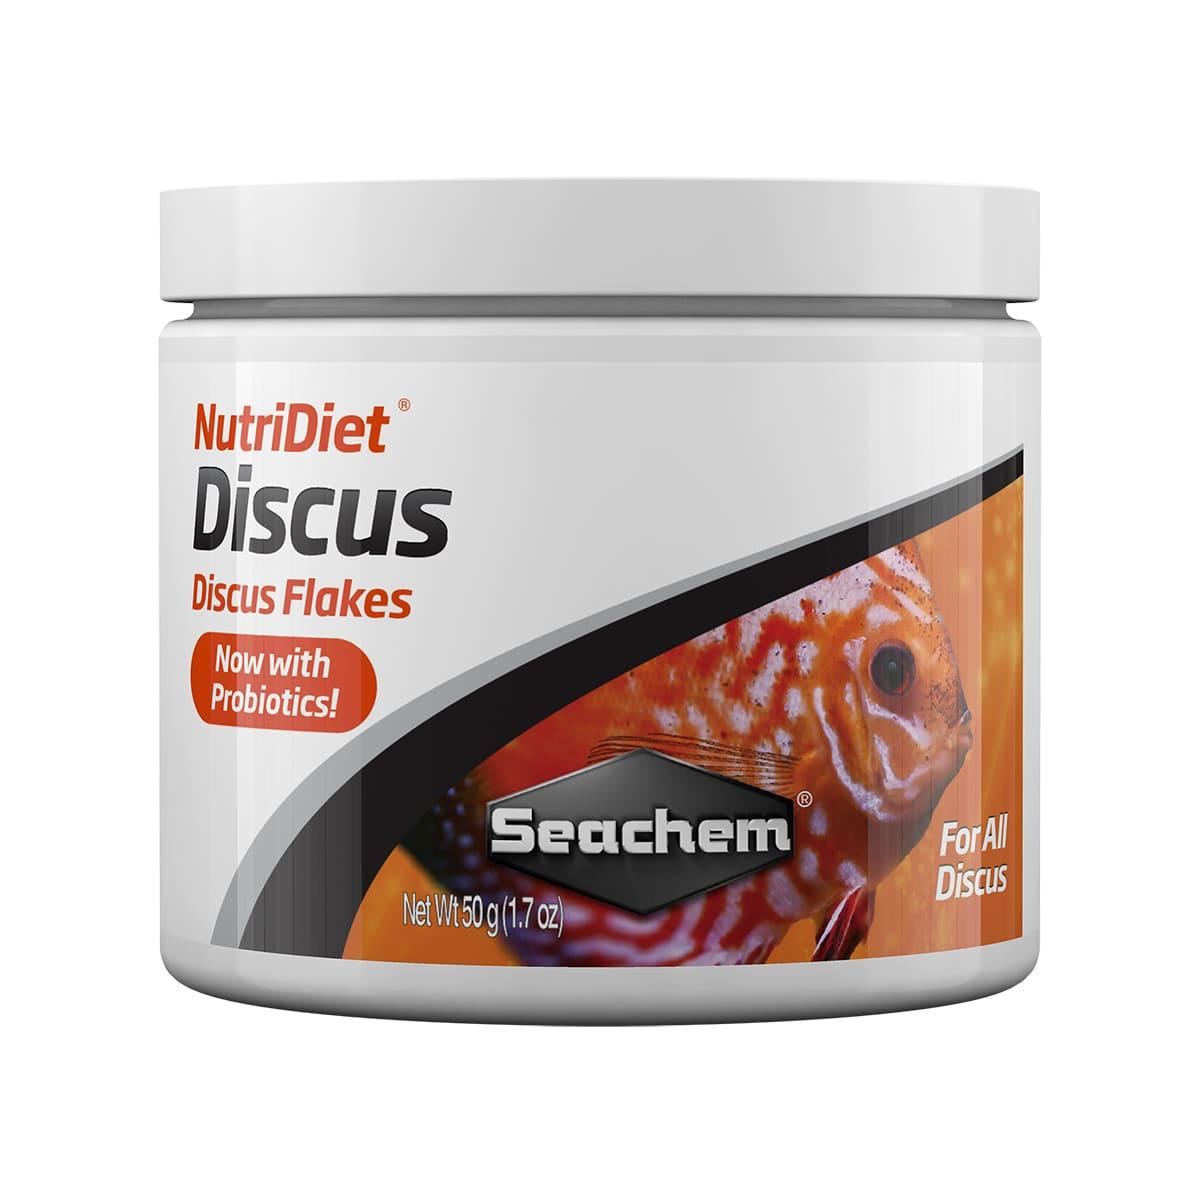 Seachem NutriDiet Discus Flakes